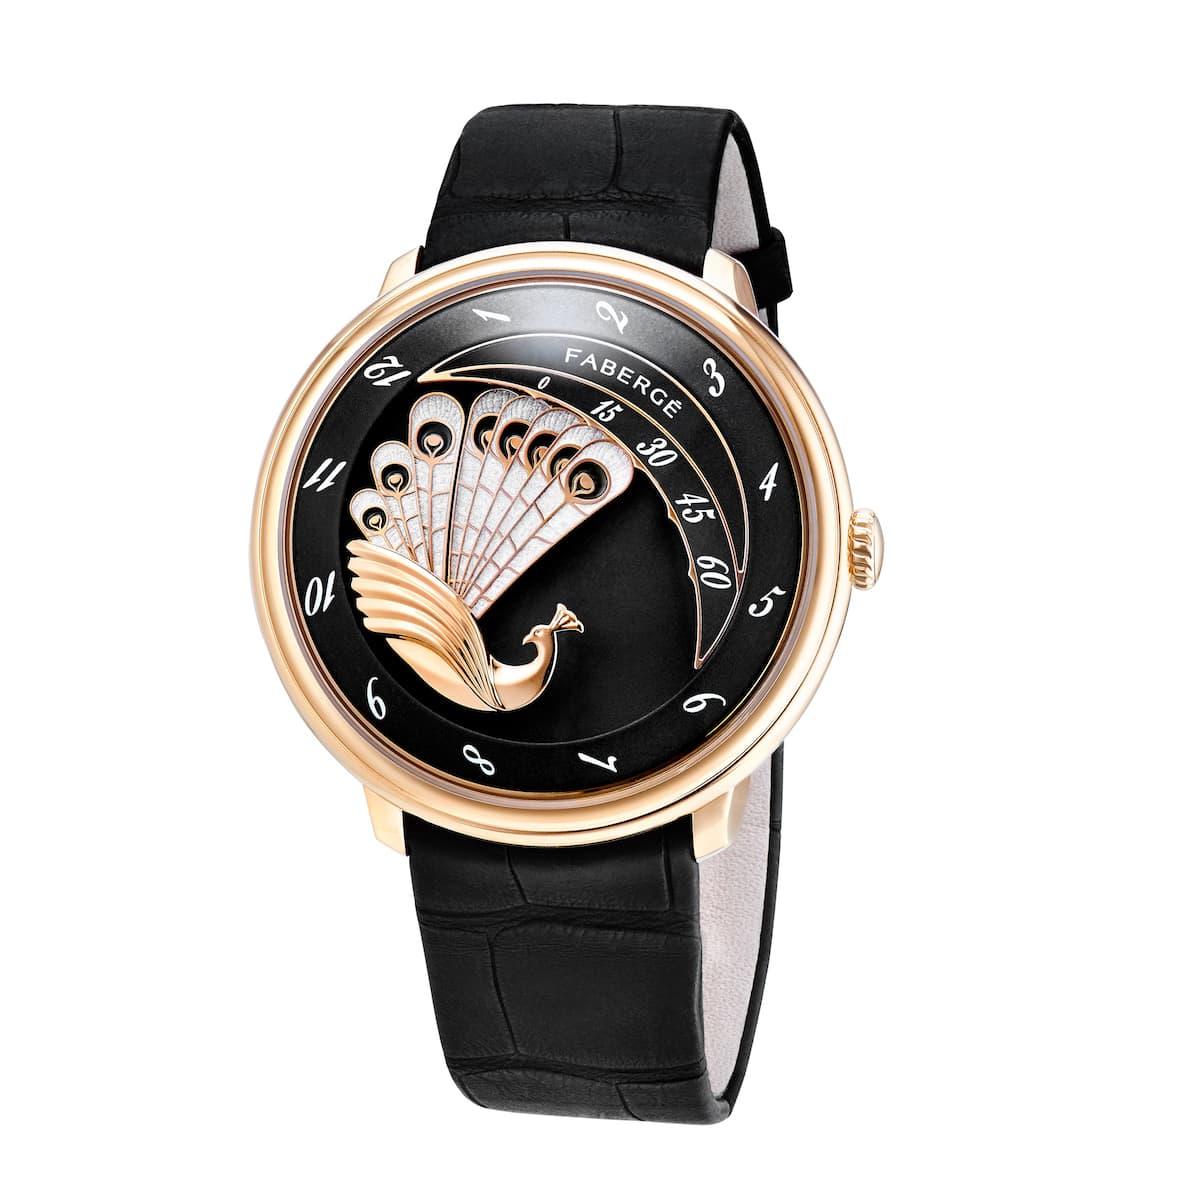 Produkt WA Lady Compliquée Rose Gold Black Peacock